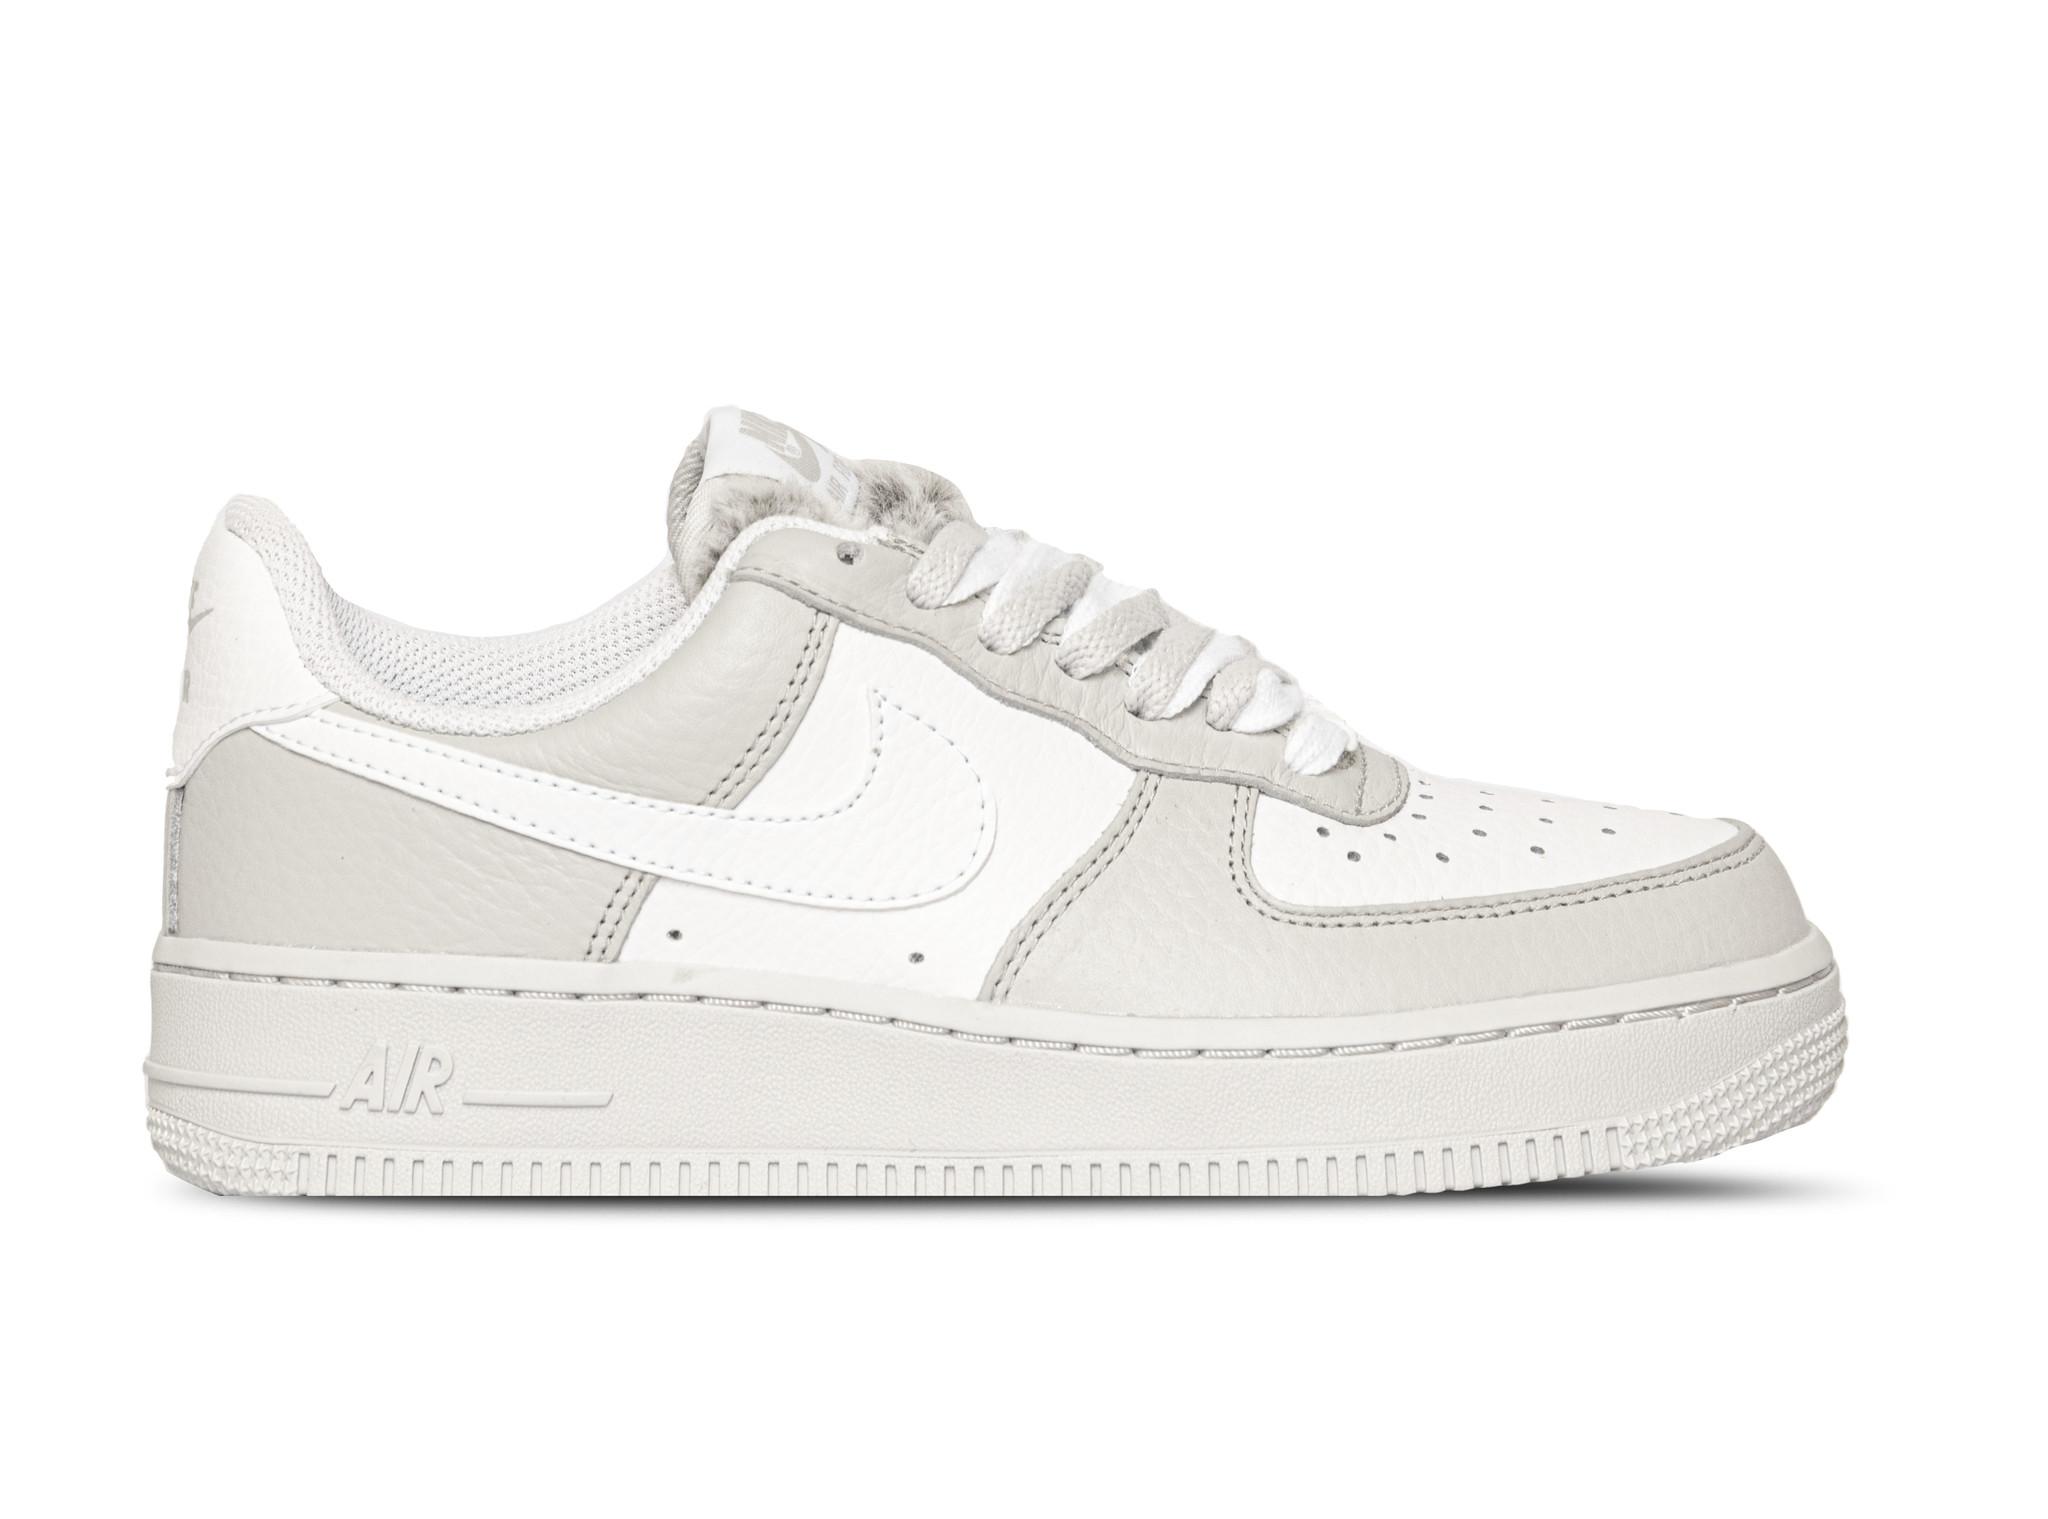 Nike Air Force 1 07 Light Bone White